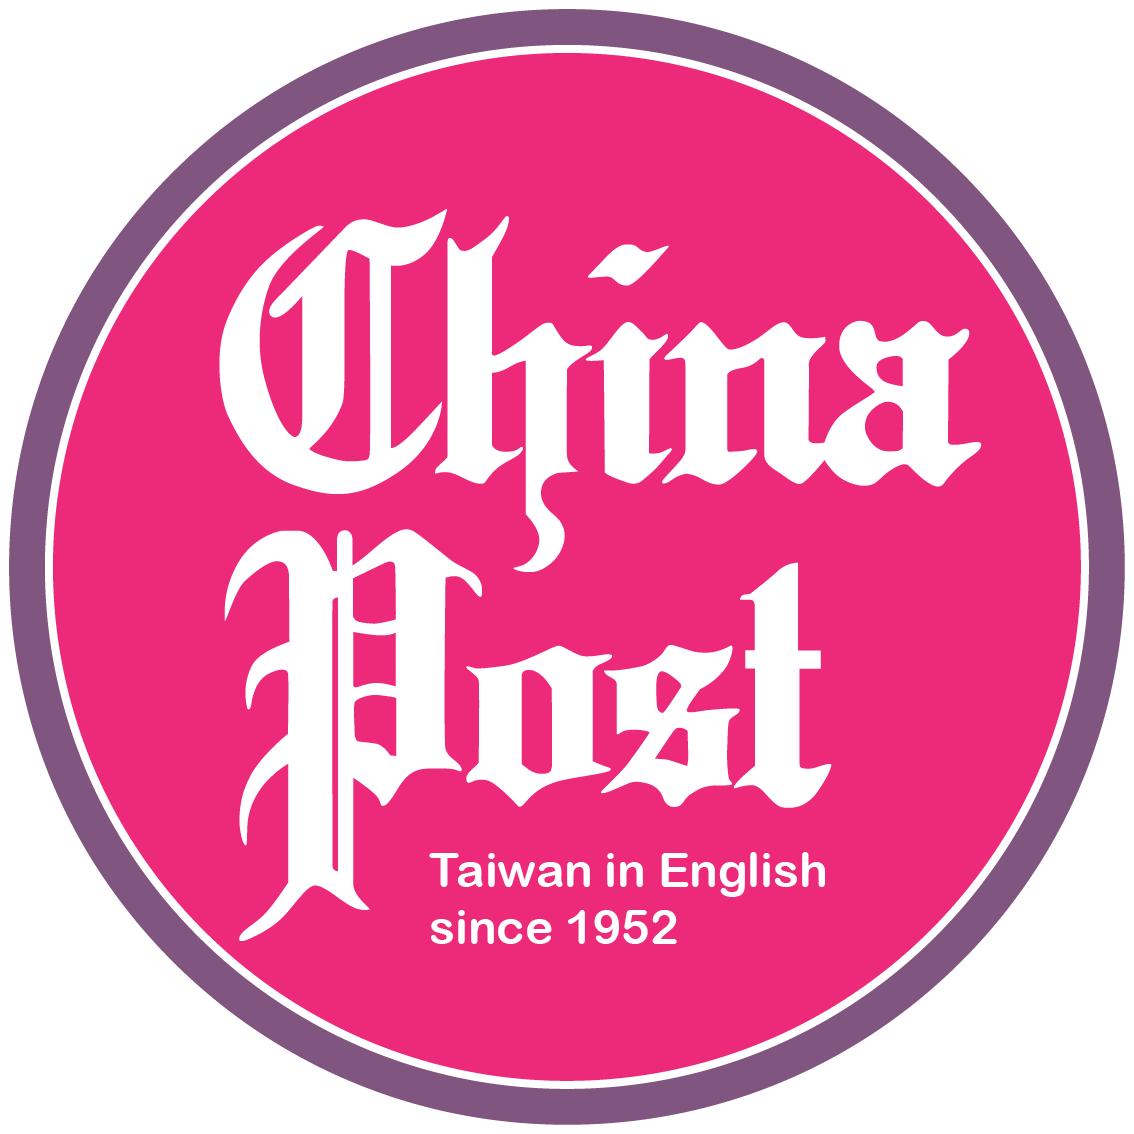 Avatar - The China Post, Taiwan